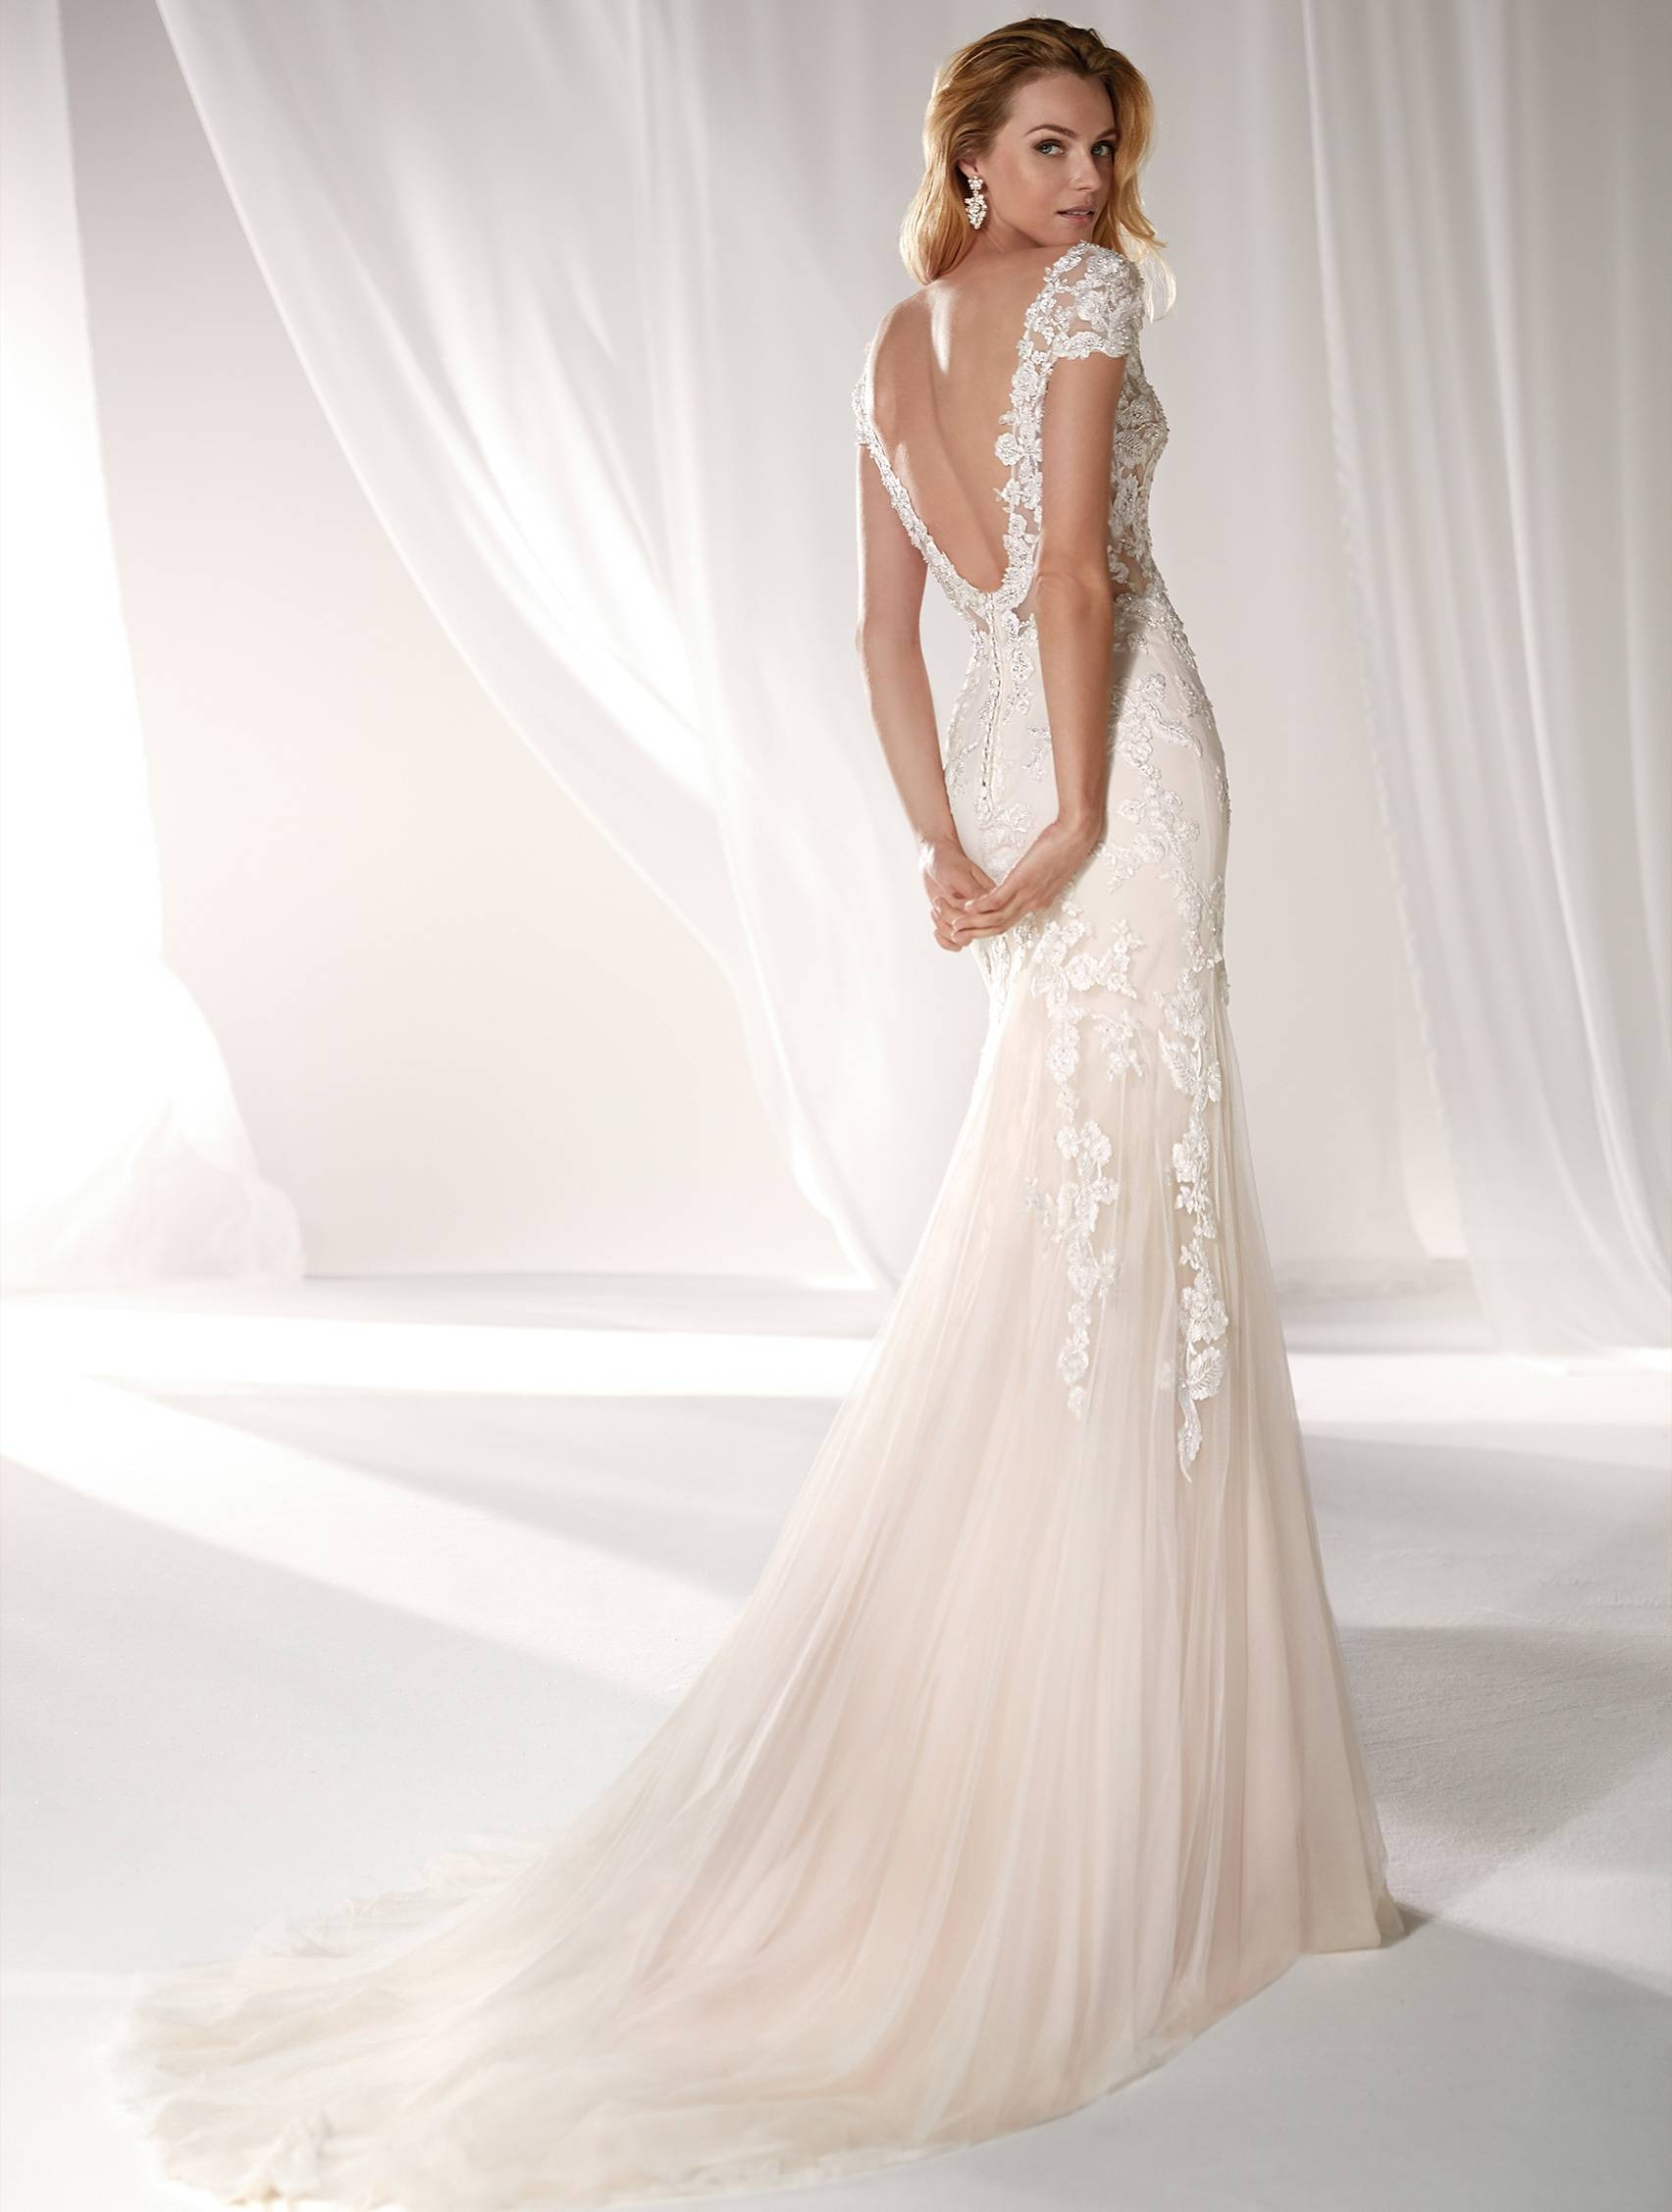 NICOLE MILANO NIA19028 DRESS